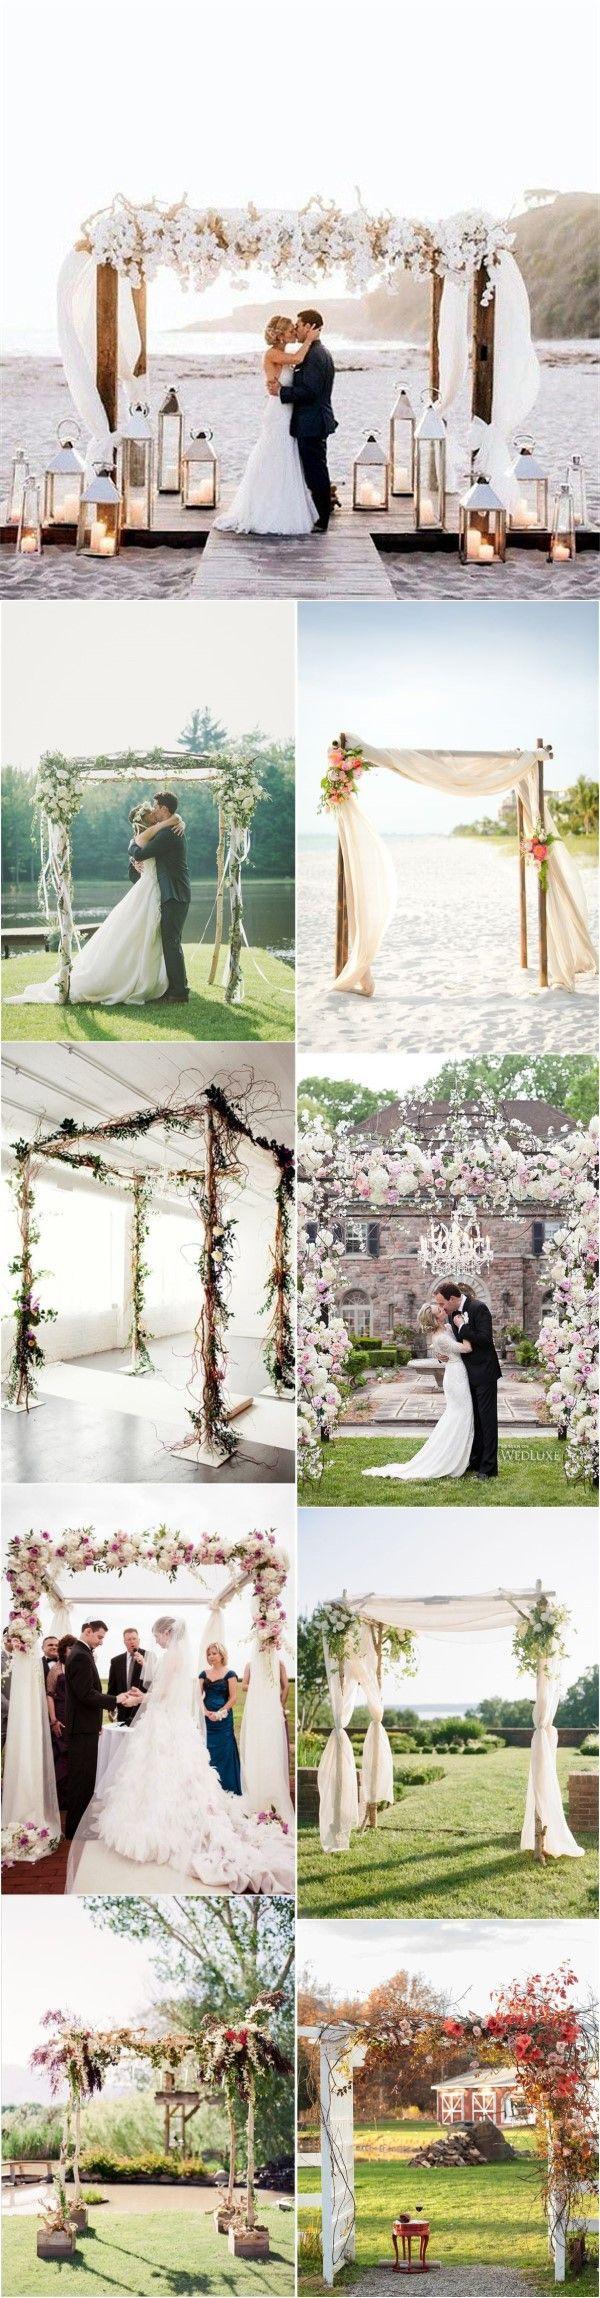 Wedding    Decorations » Imaginative Unique Floral Wedding Chuppah Altar Decoration    Ideas » ❤️ See more:    http://www.weddinginclude.com/2017/06/imaginative-unique-floral-wedding-chuppah-altar-decoration-ideas/